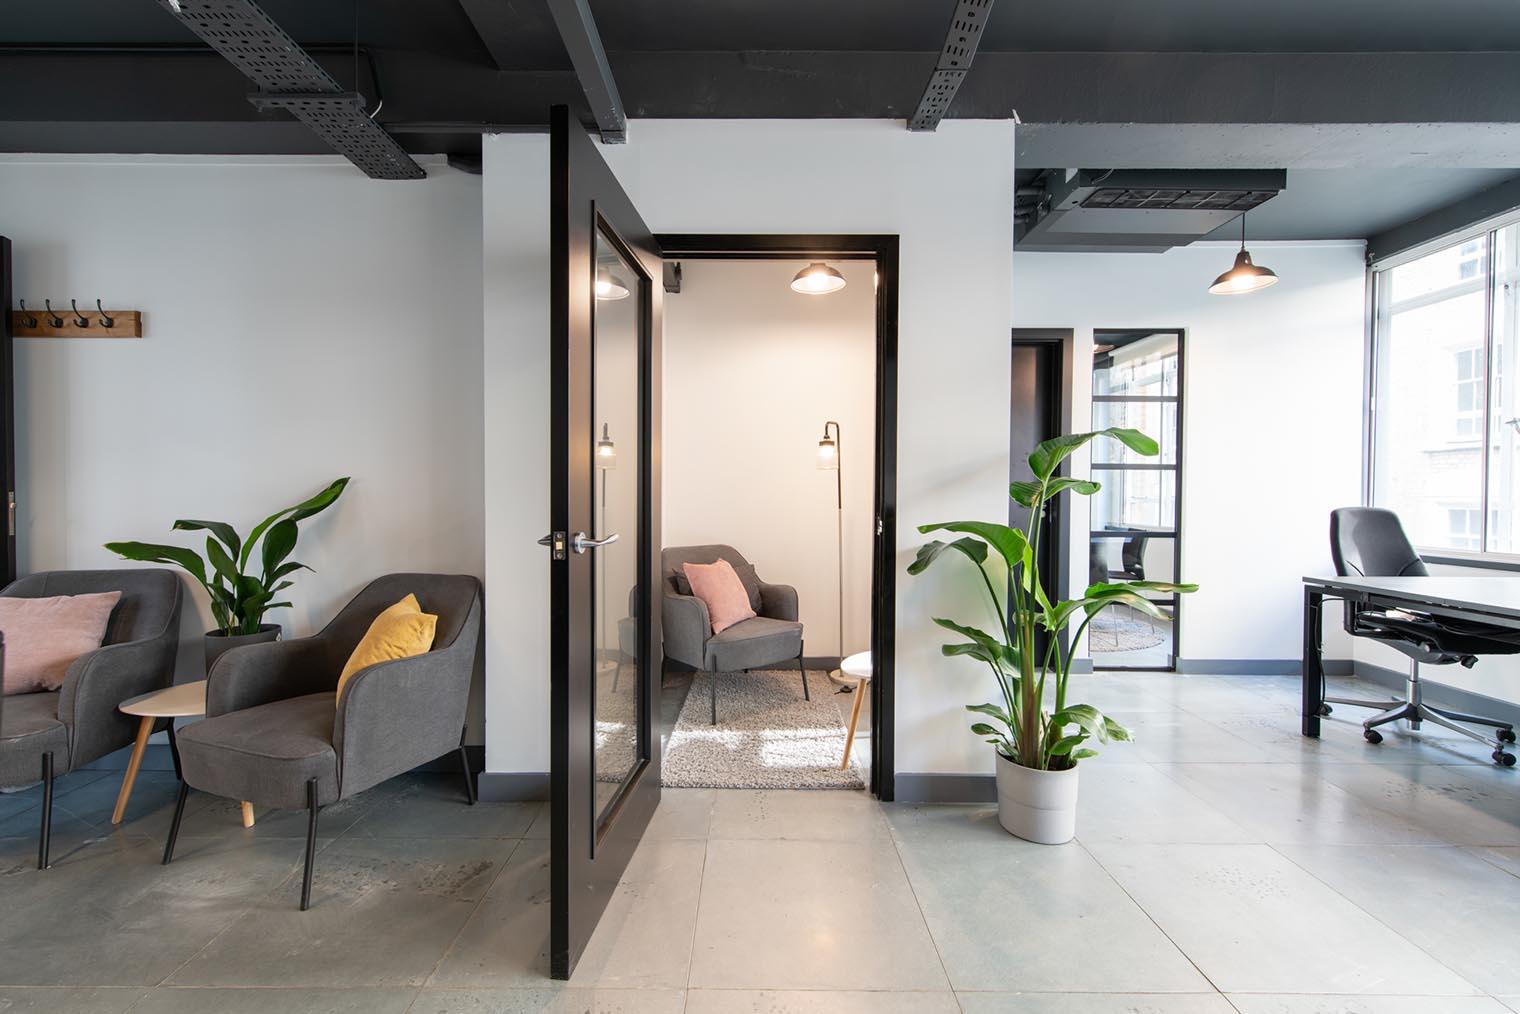 Tech startup office space London - Luke Street, Shoreditch